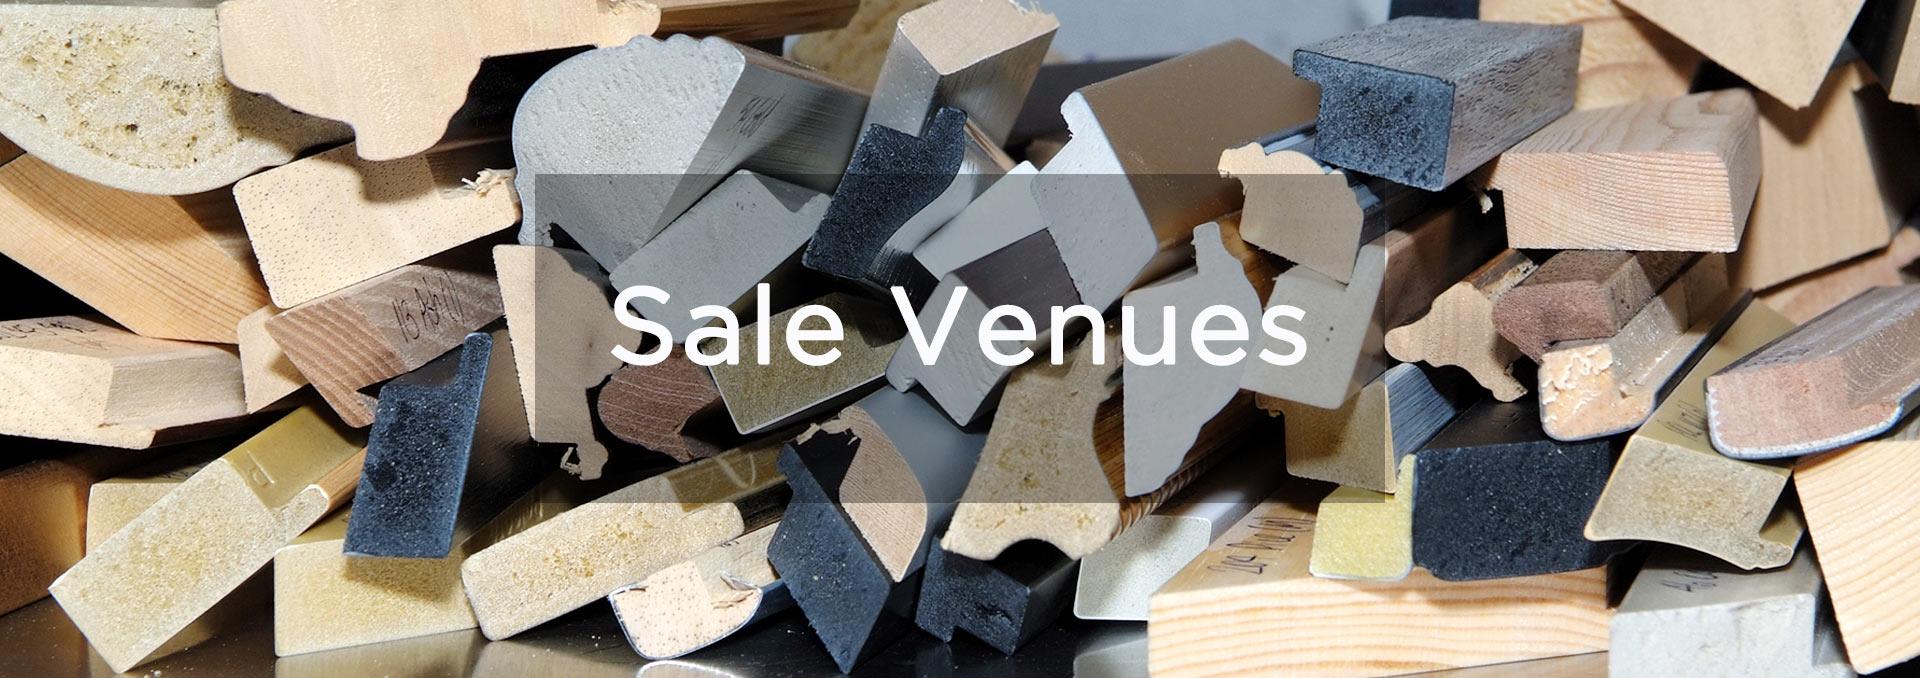 picture-frame-sales-venues